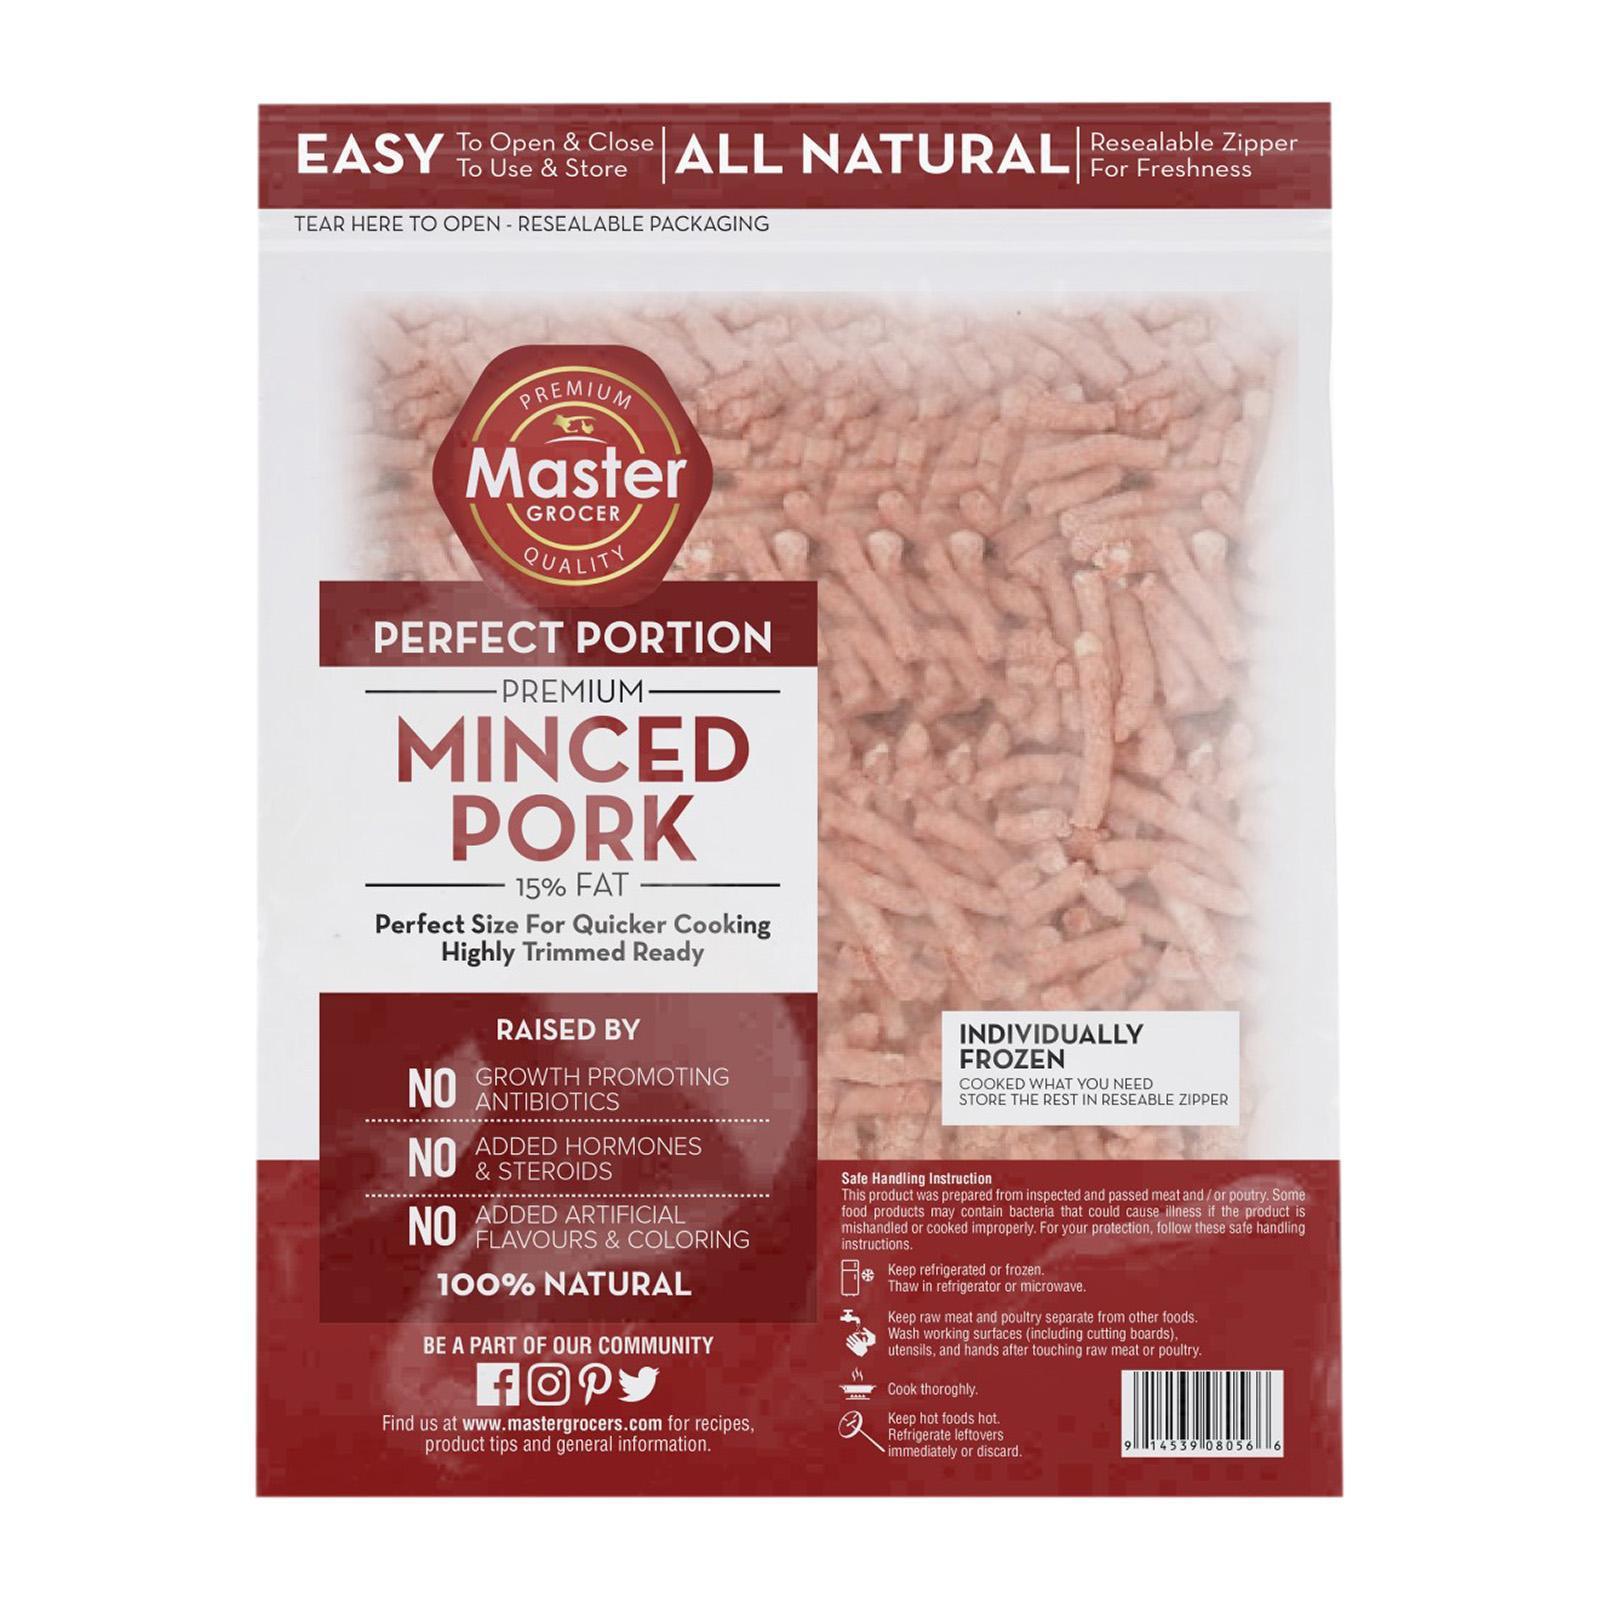 Master Grocer Minced Pork - Frozen